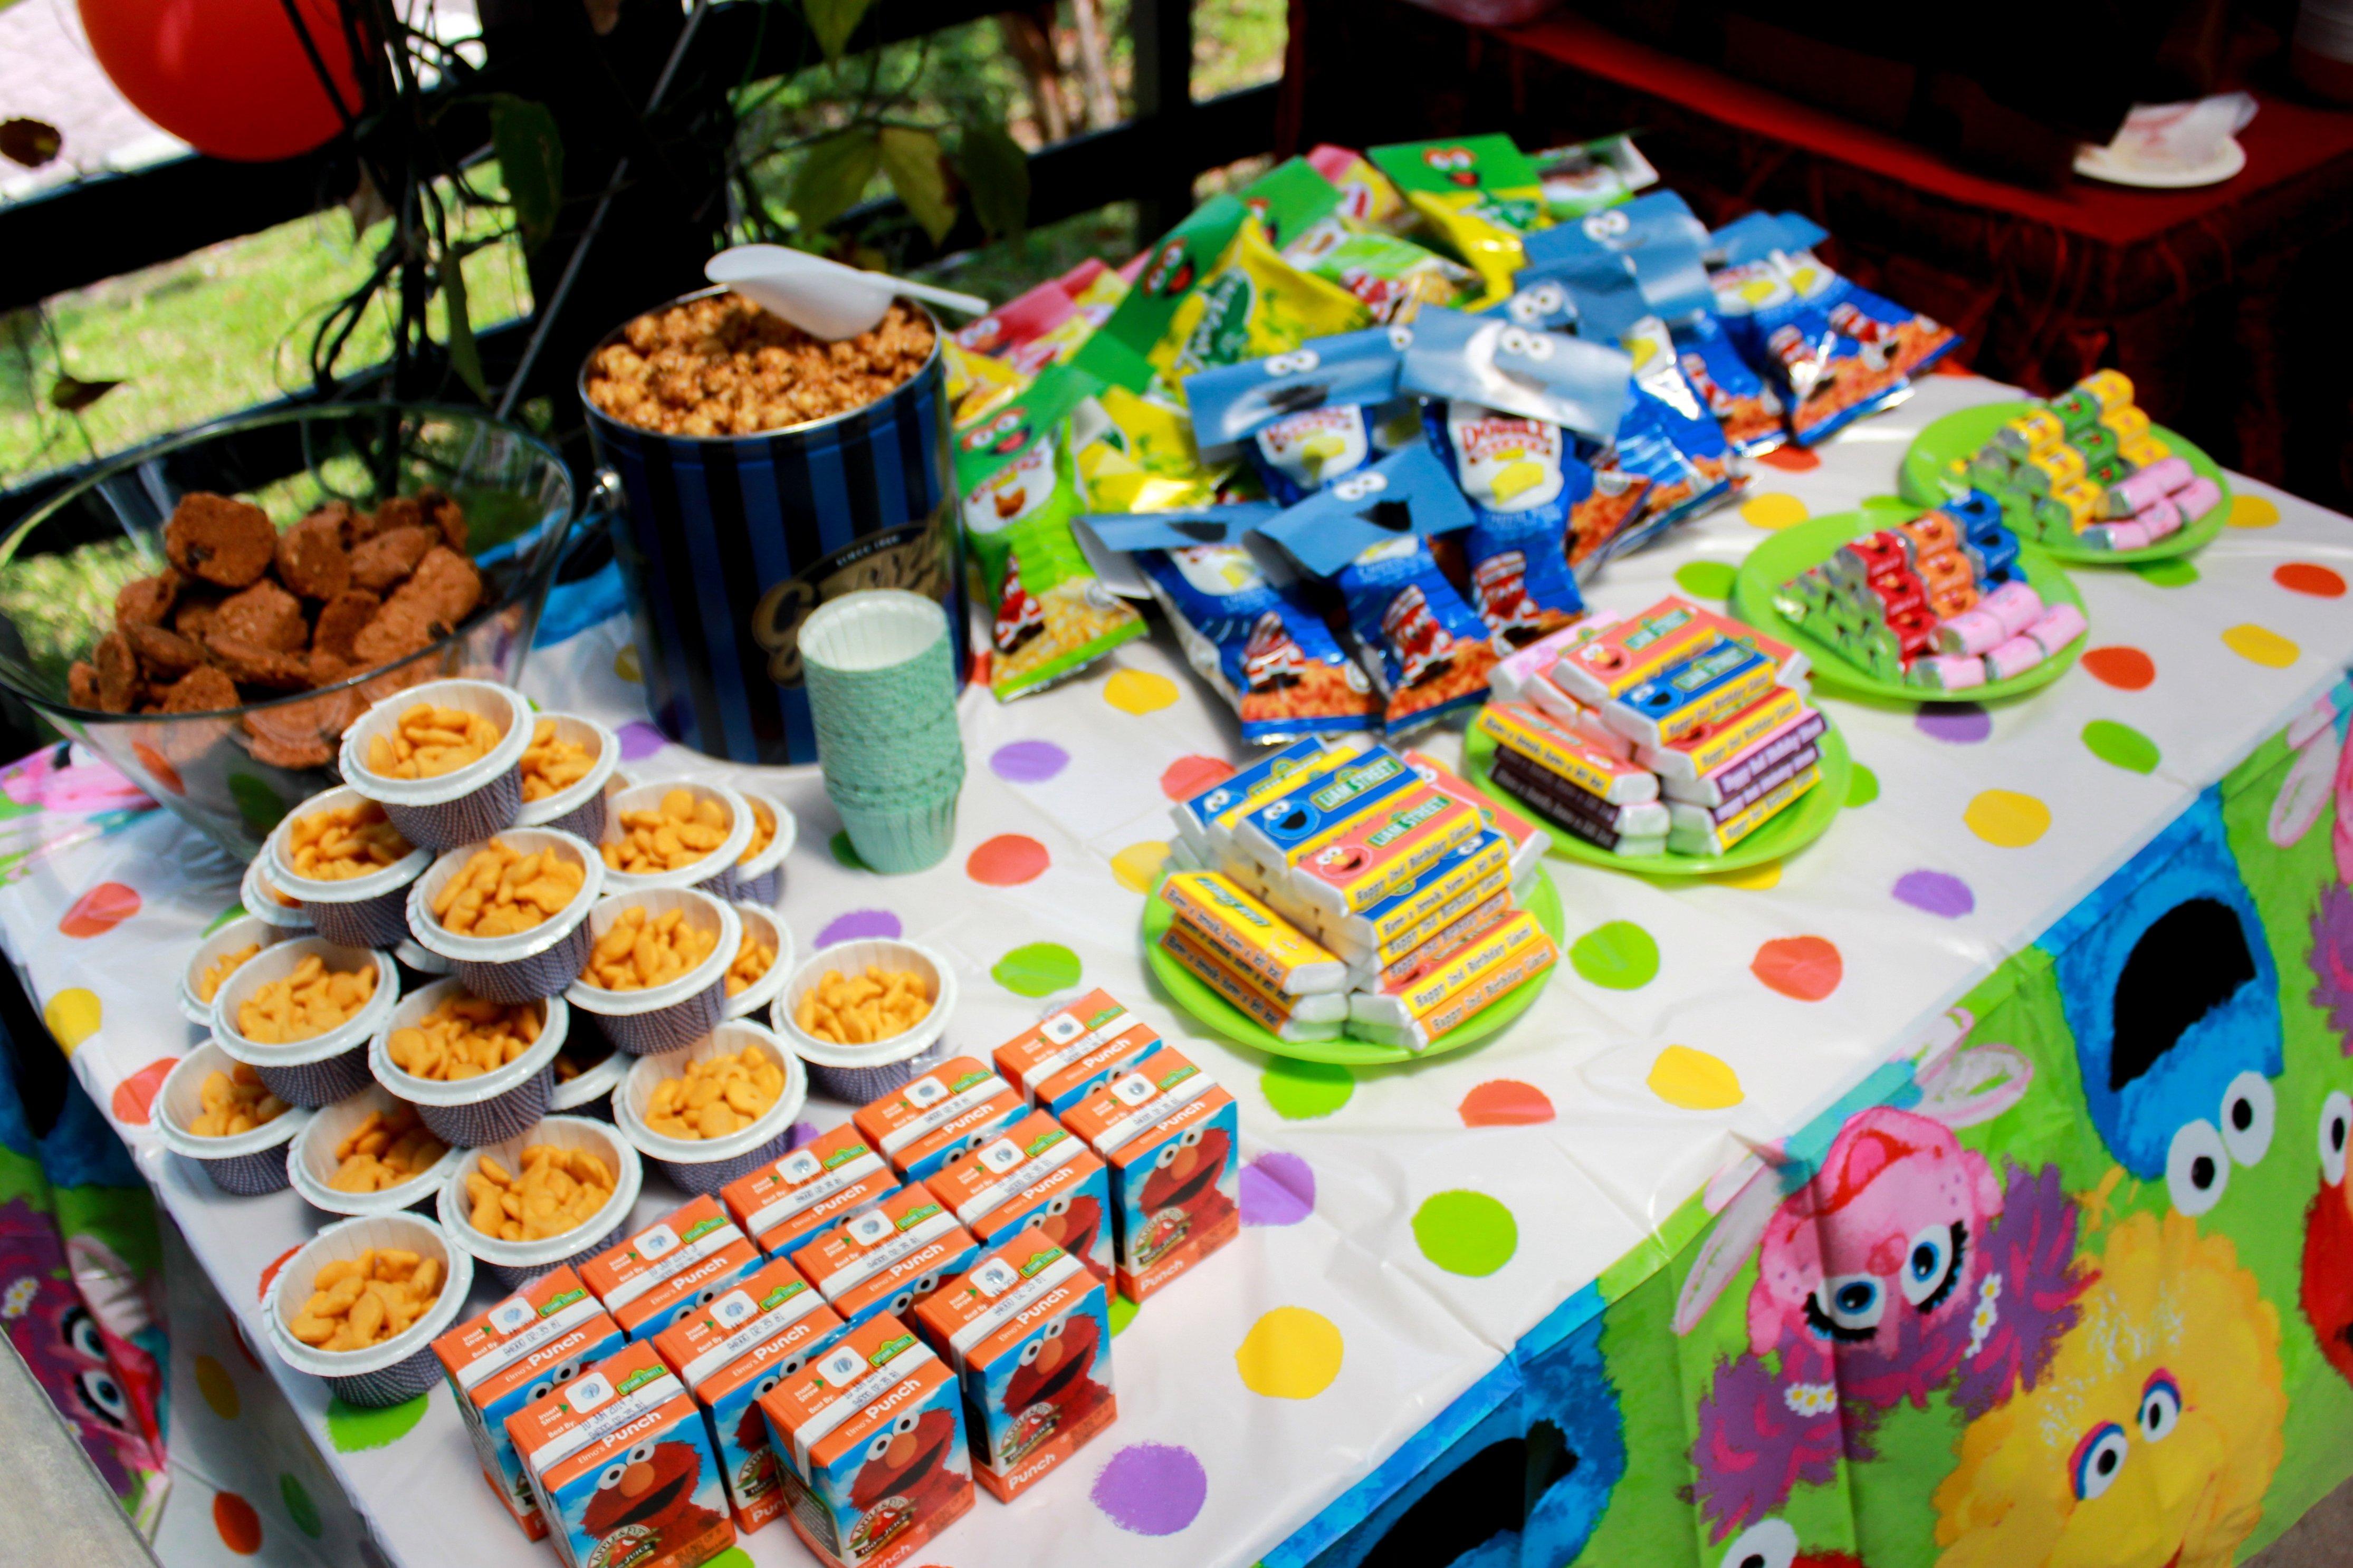 10 Attractive Sesame Street Party Food Ideas liam turns 2 a sesame street kinda birthday bash so natty 2020